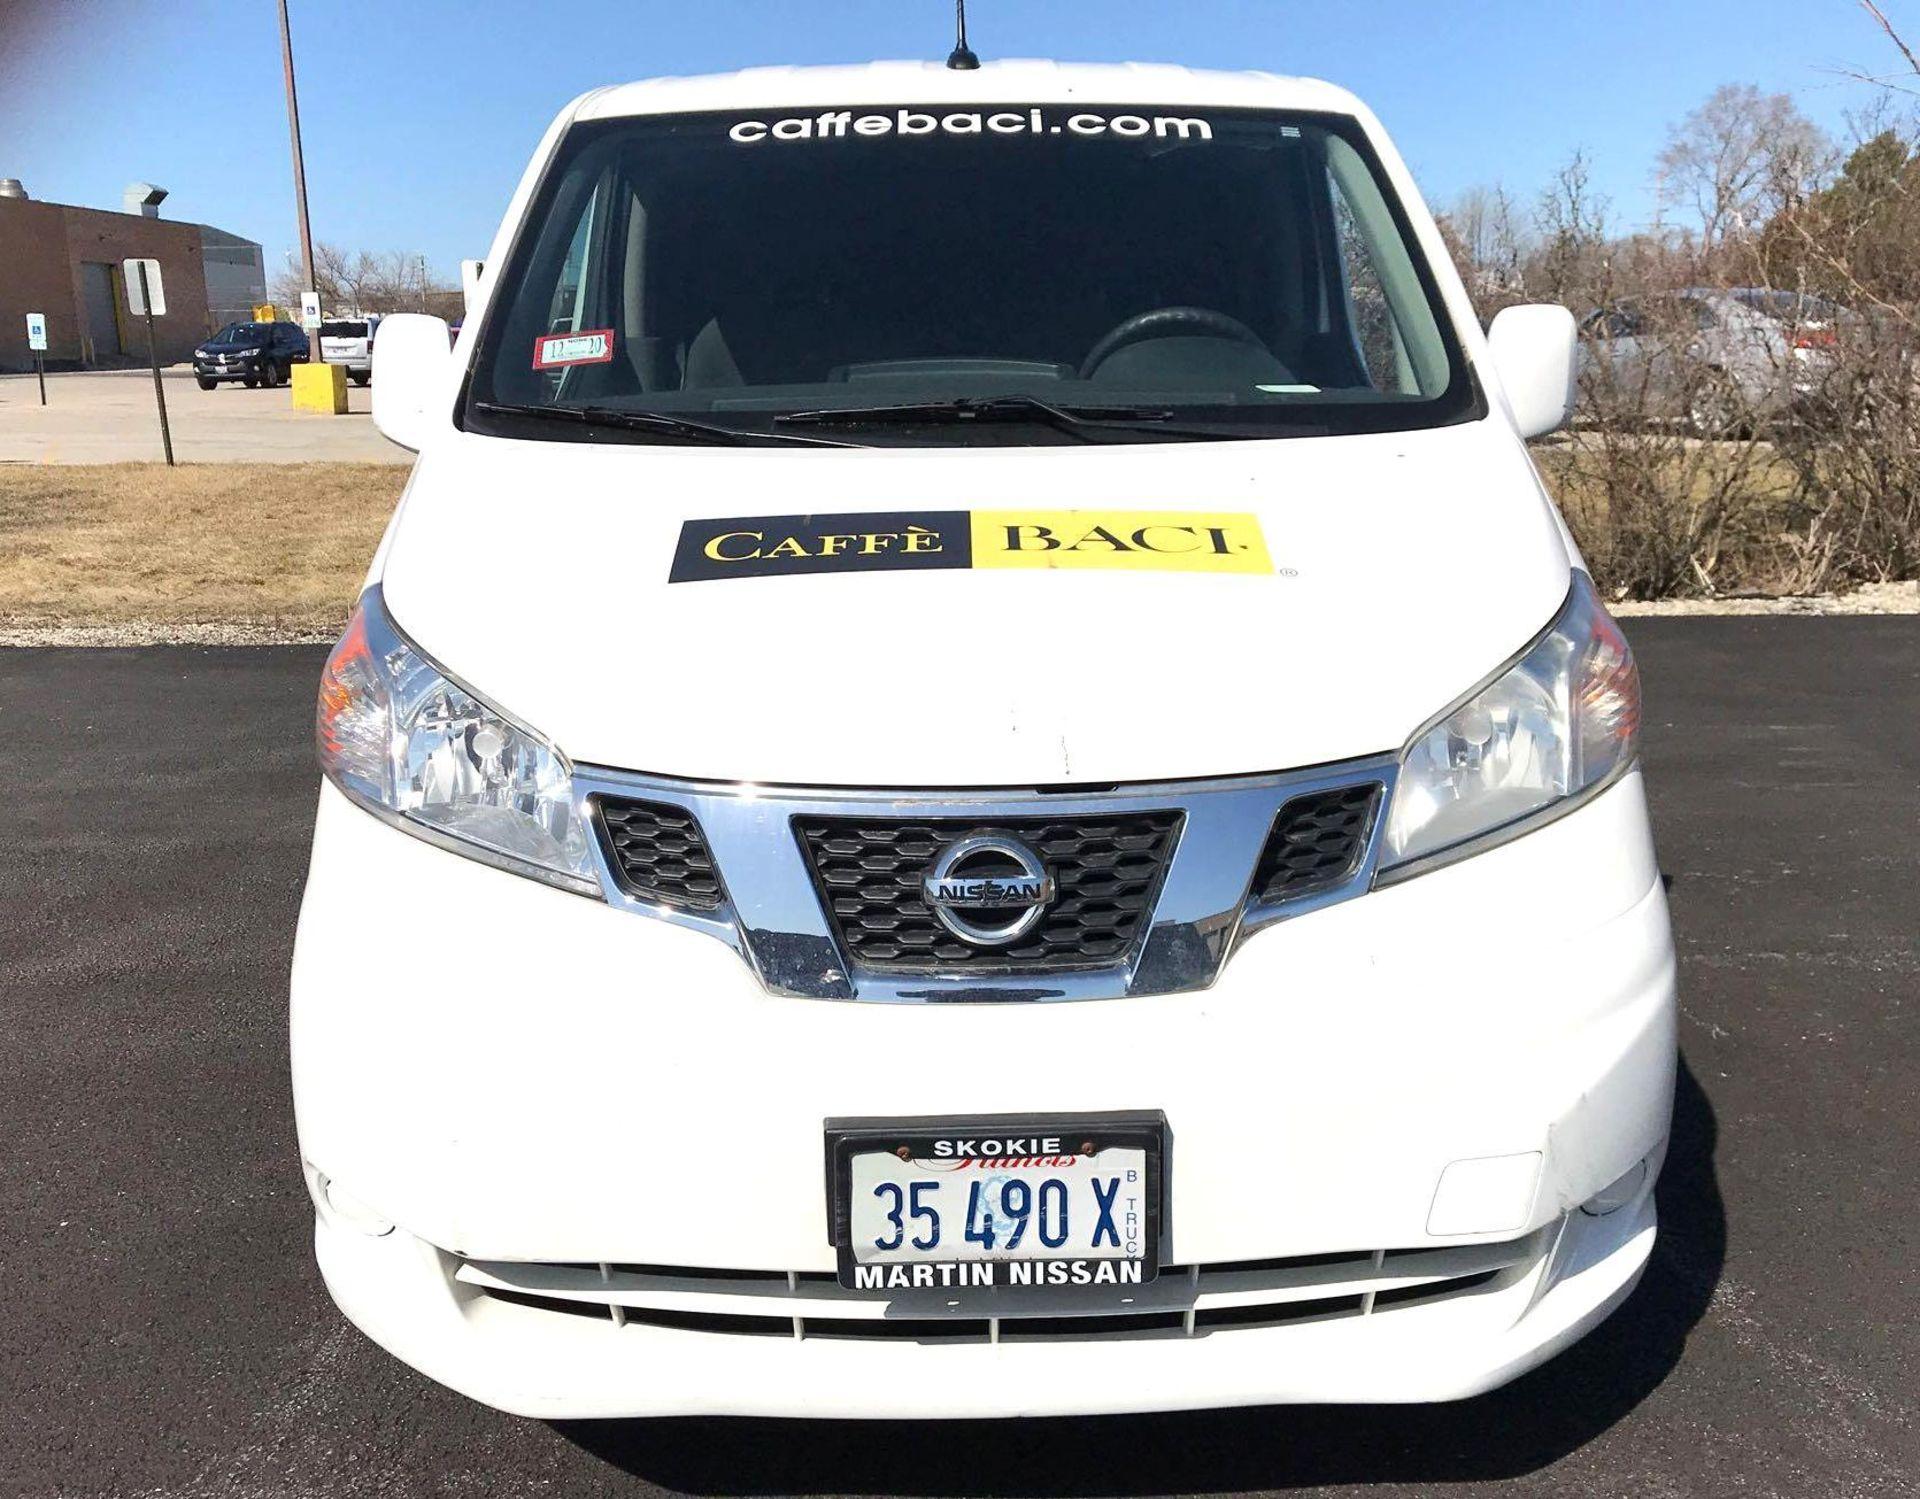 2013 Nissan NV200 Delivery Van - Image 2 of 54